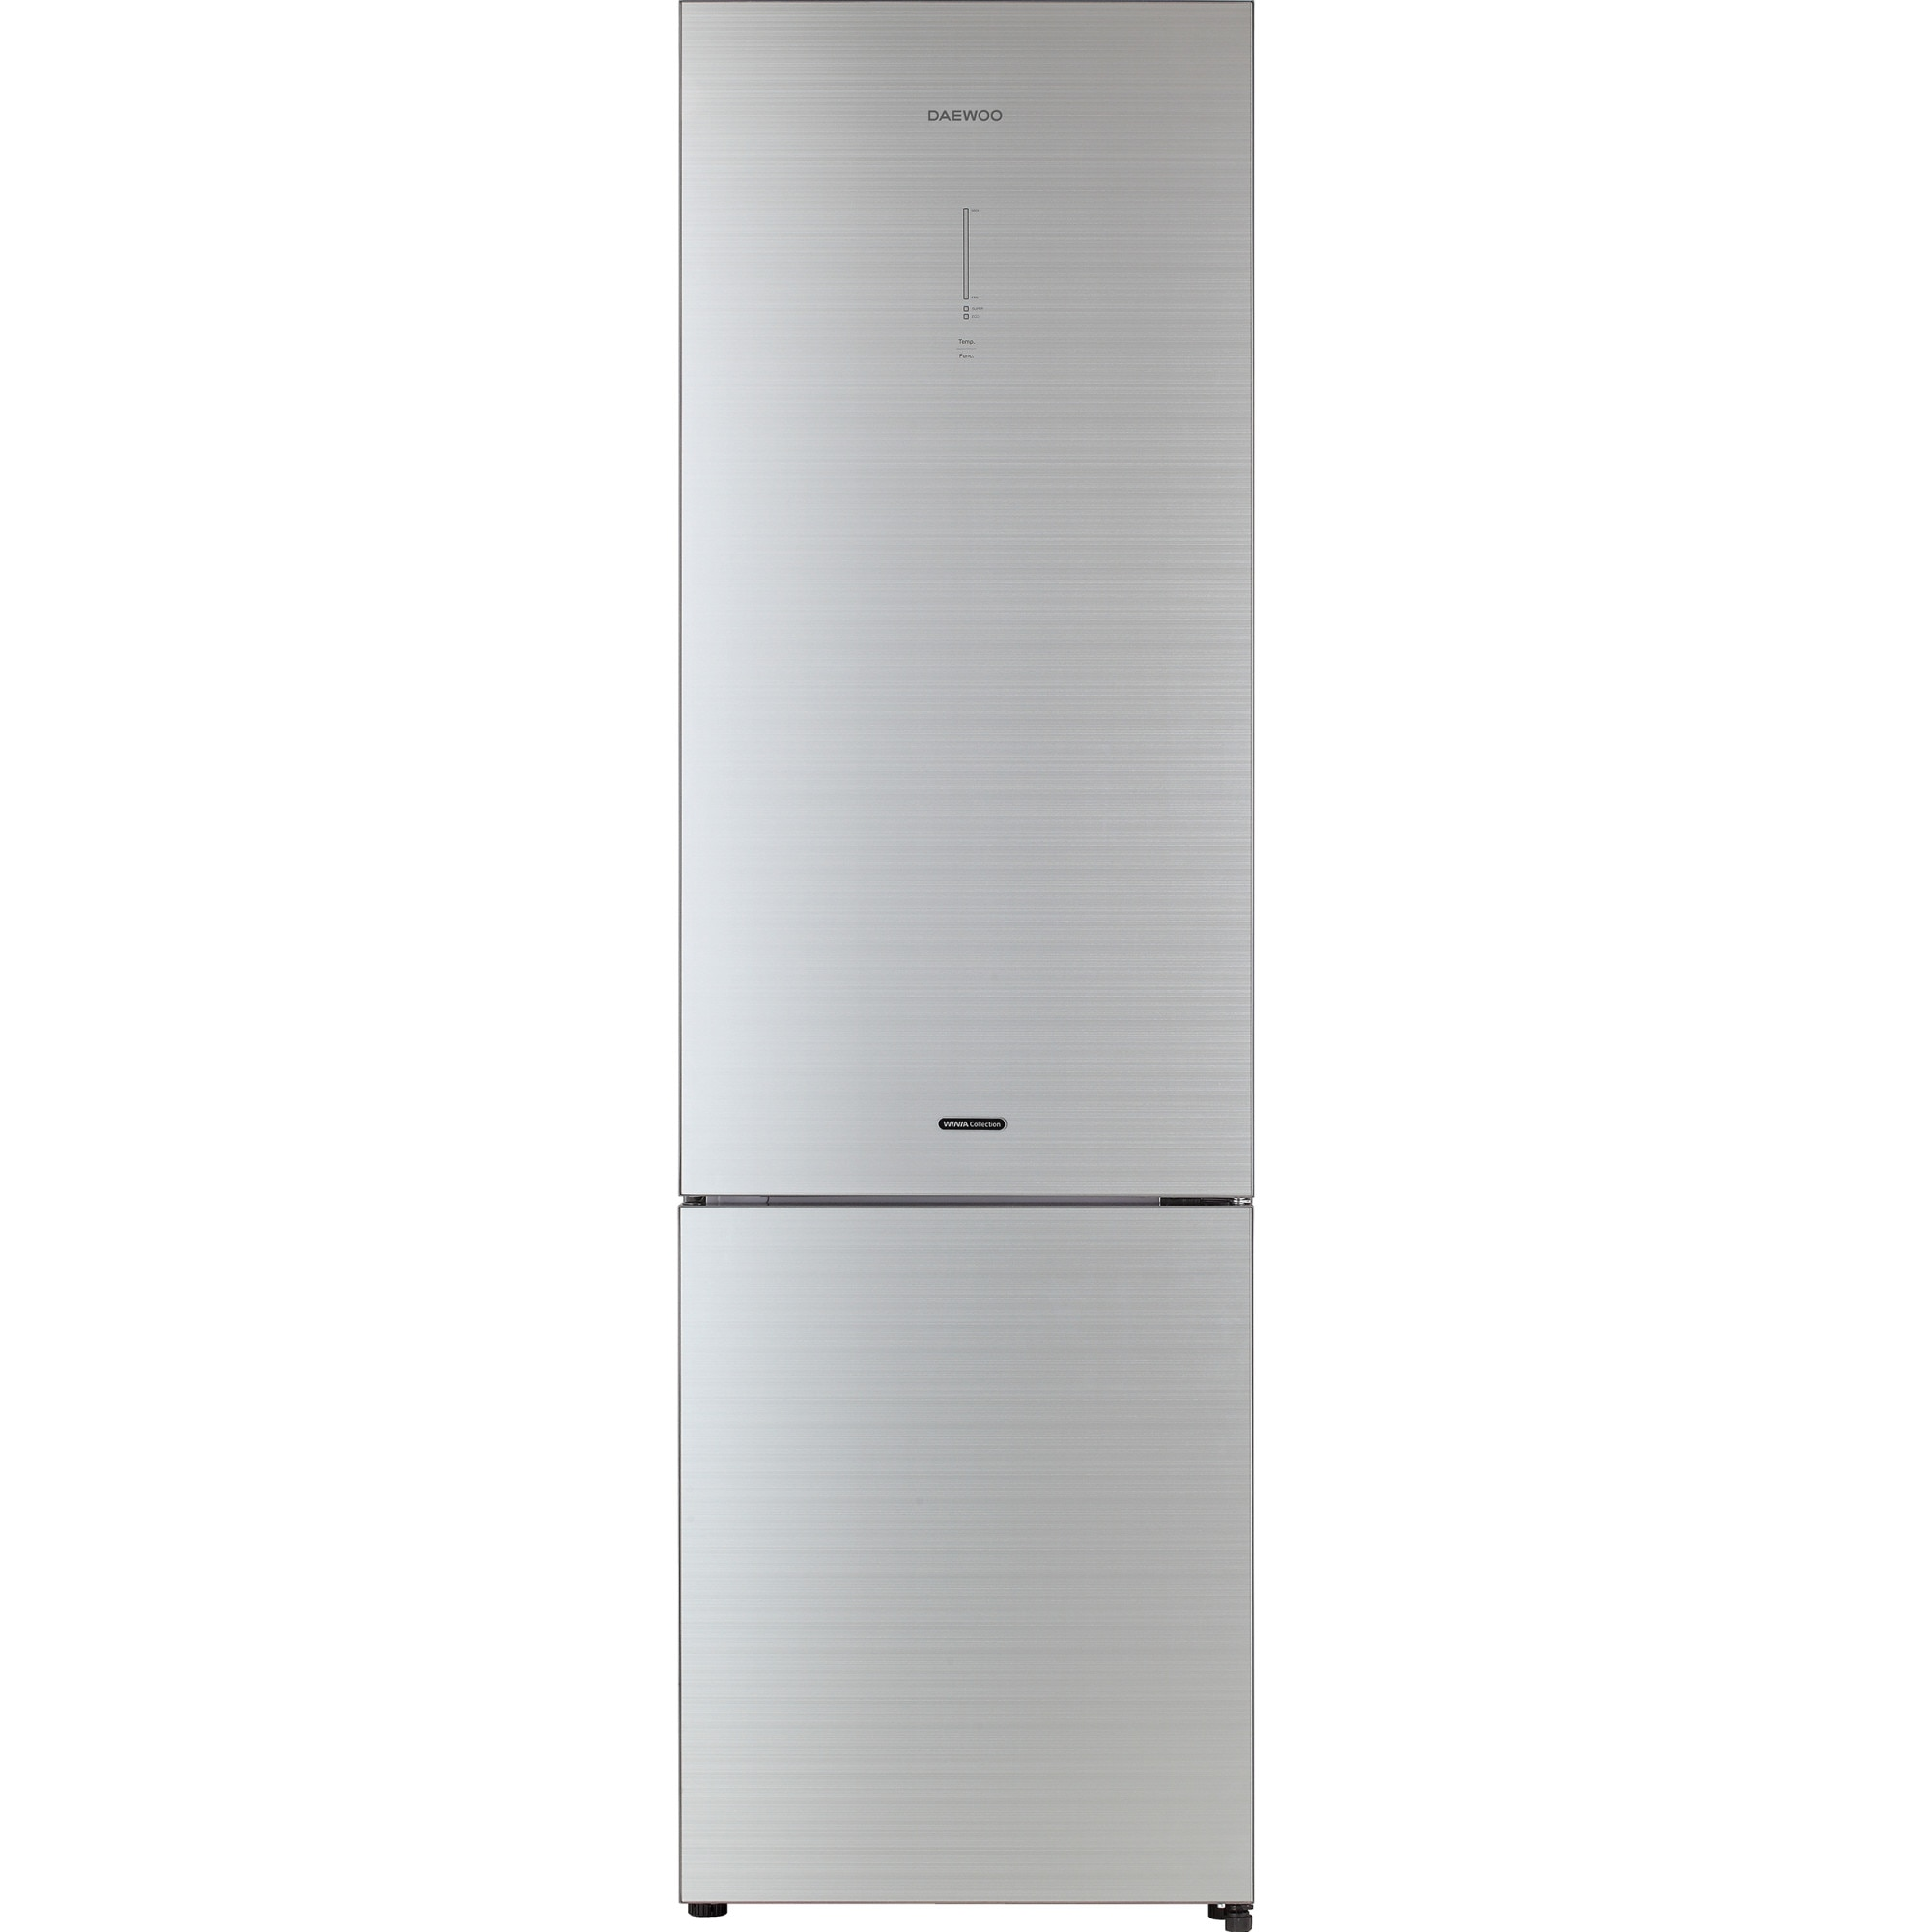 Fotografie Combina frigorifica Daewoo RN-T536RGS, 362 l, Clasa A++, Full No Frost, Iluminare LED, H 200 cm, Argintiu